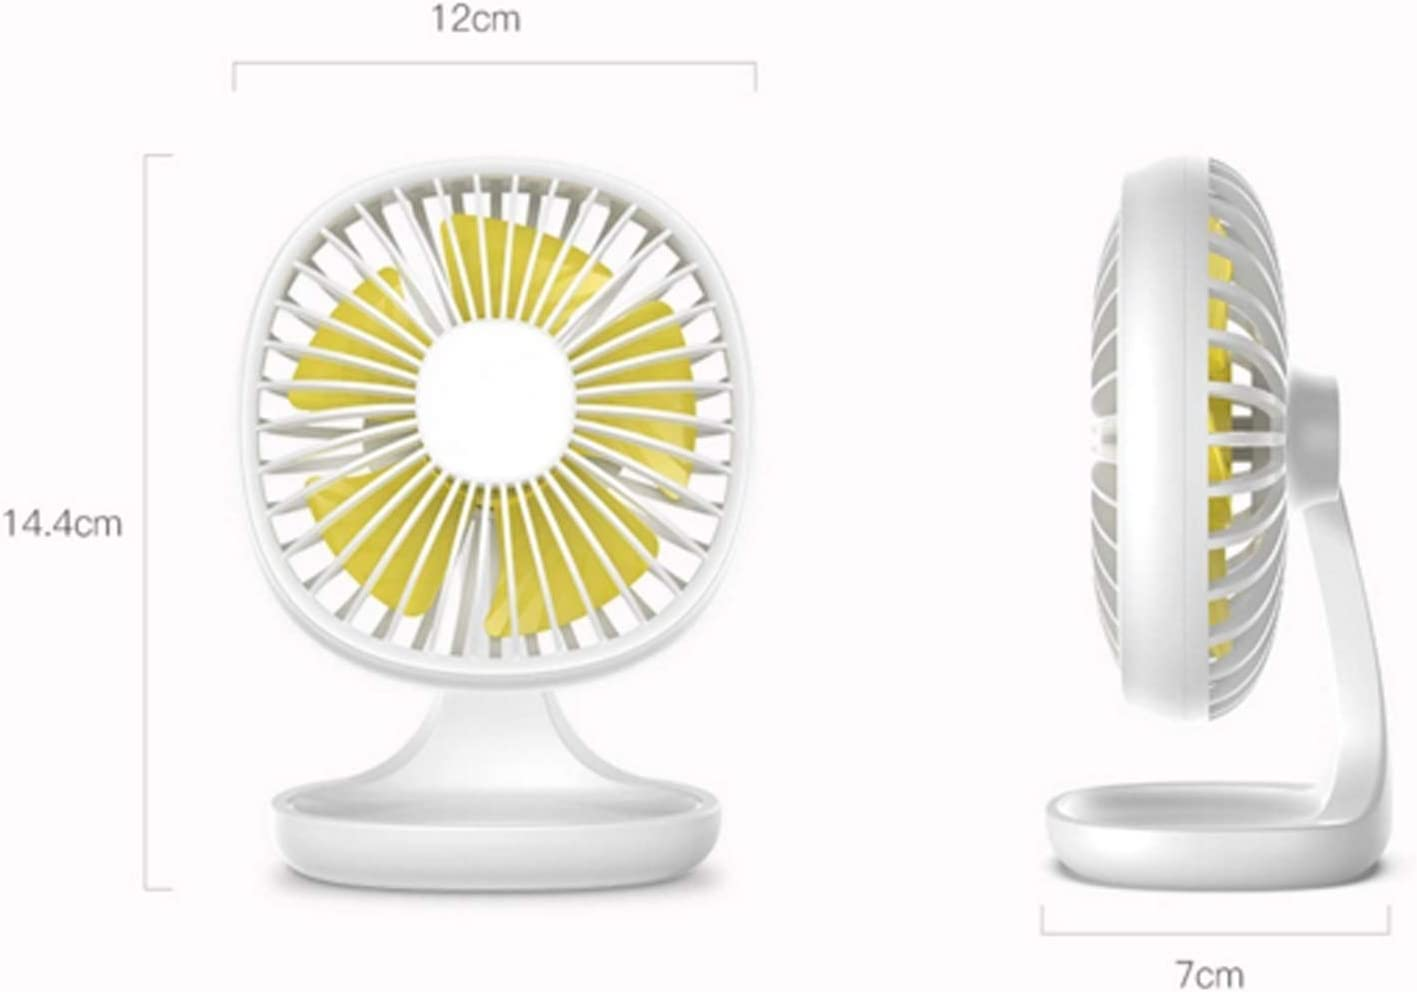 Air Cooler Portable USB Fan 3 Speed Mini Fan Office Desktop Electric Small Fan Summer Cooler Air Cooling Fan Item Storage Color : White